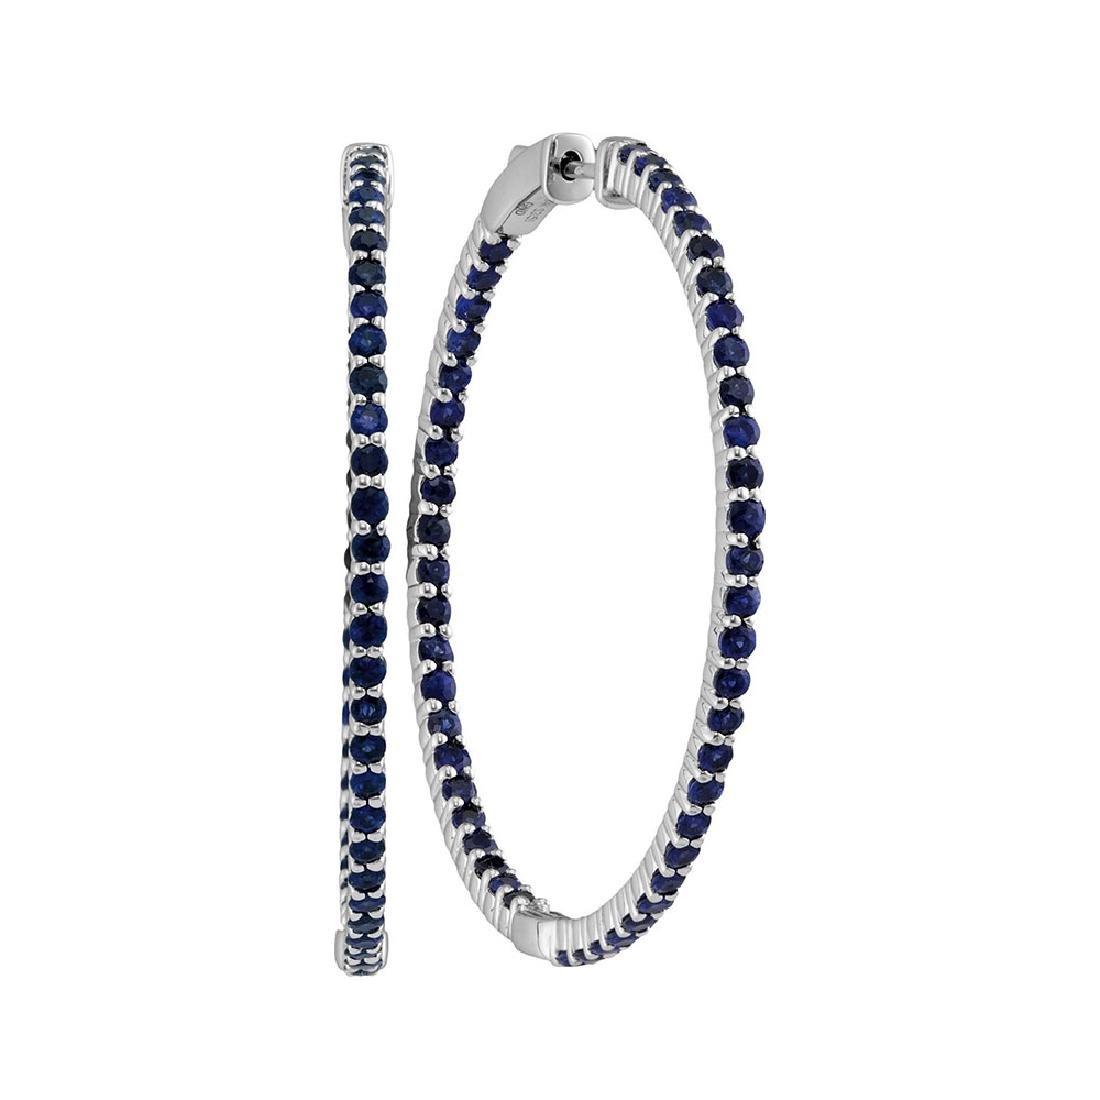 3.75 CTW Blue Sapphire Hoop Earrings 14KT White Gold -